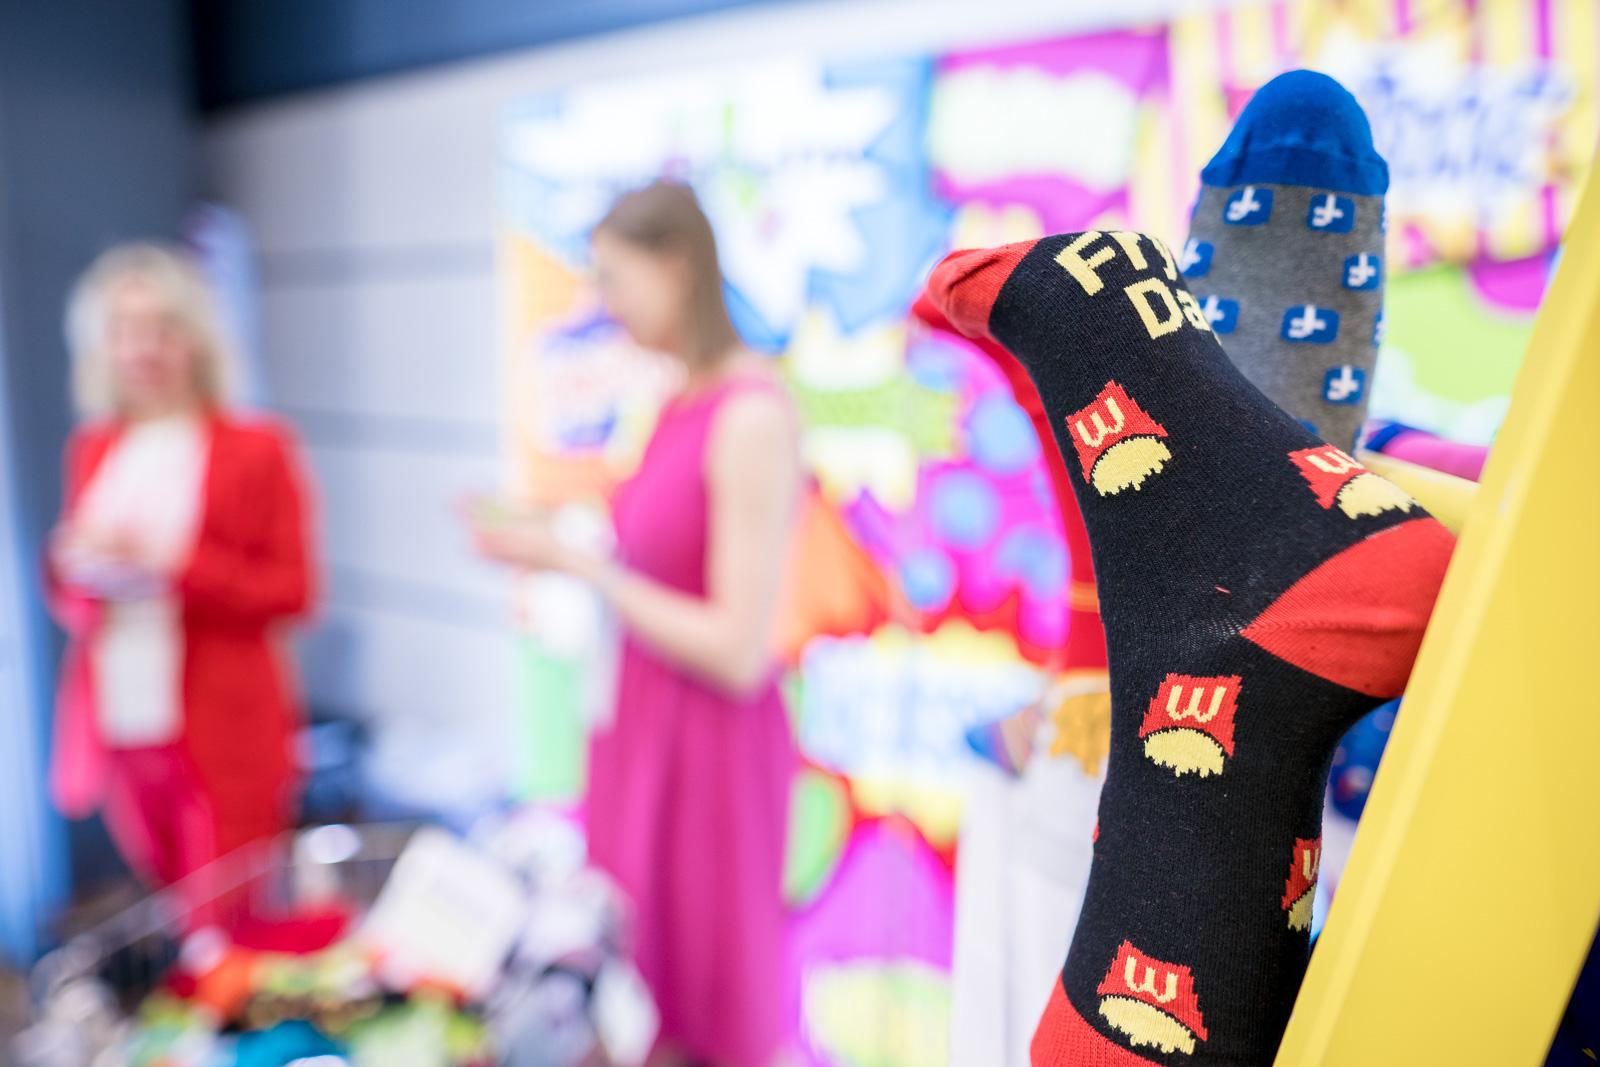 Messefotografie - Haptica - Bonn - Veranstalter WA Media - bunte Socken